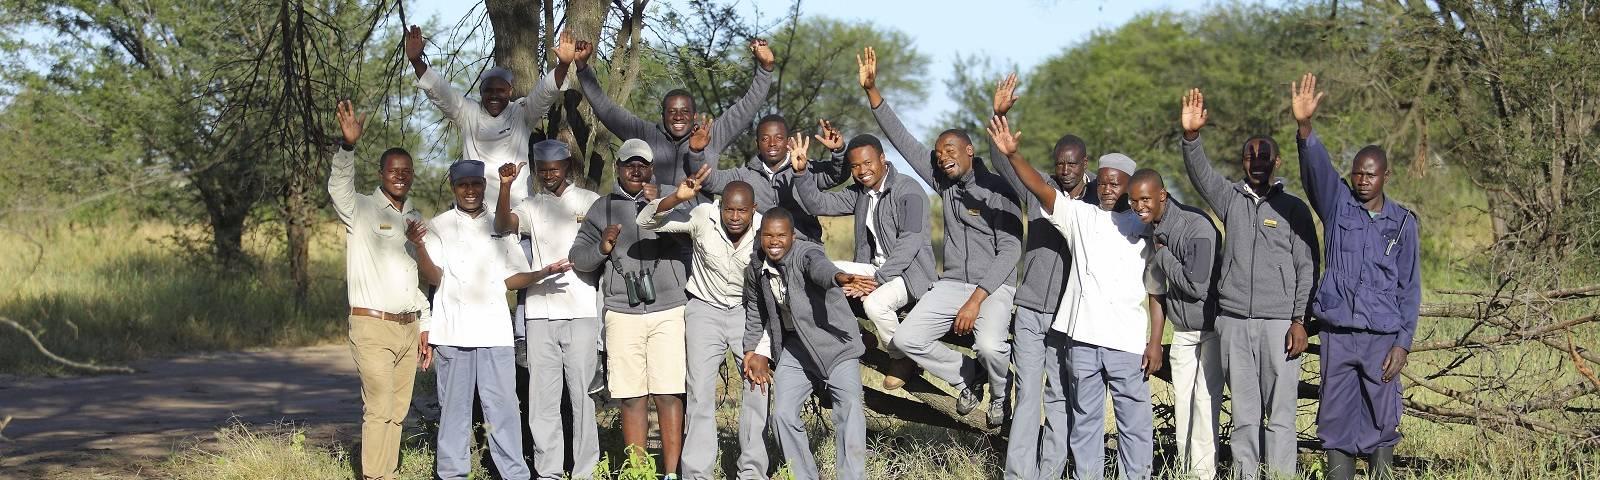 Olakira - the olakira team